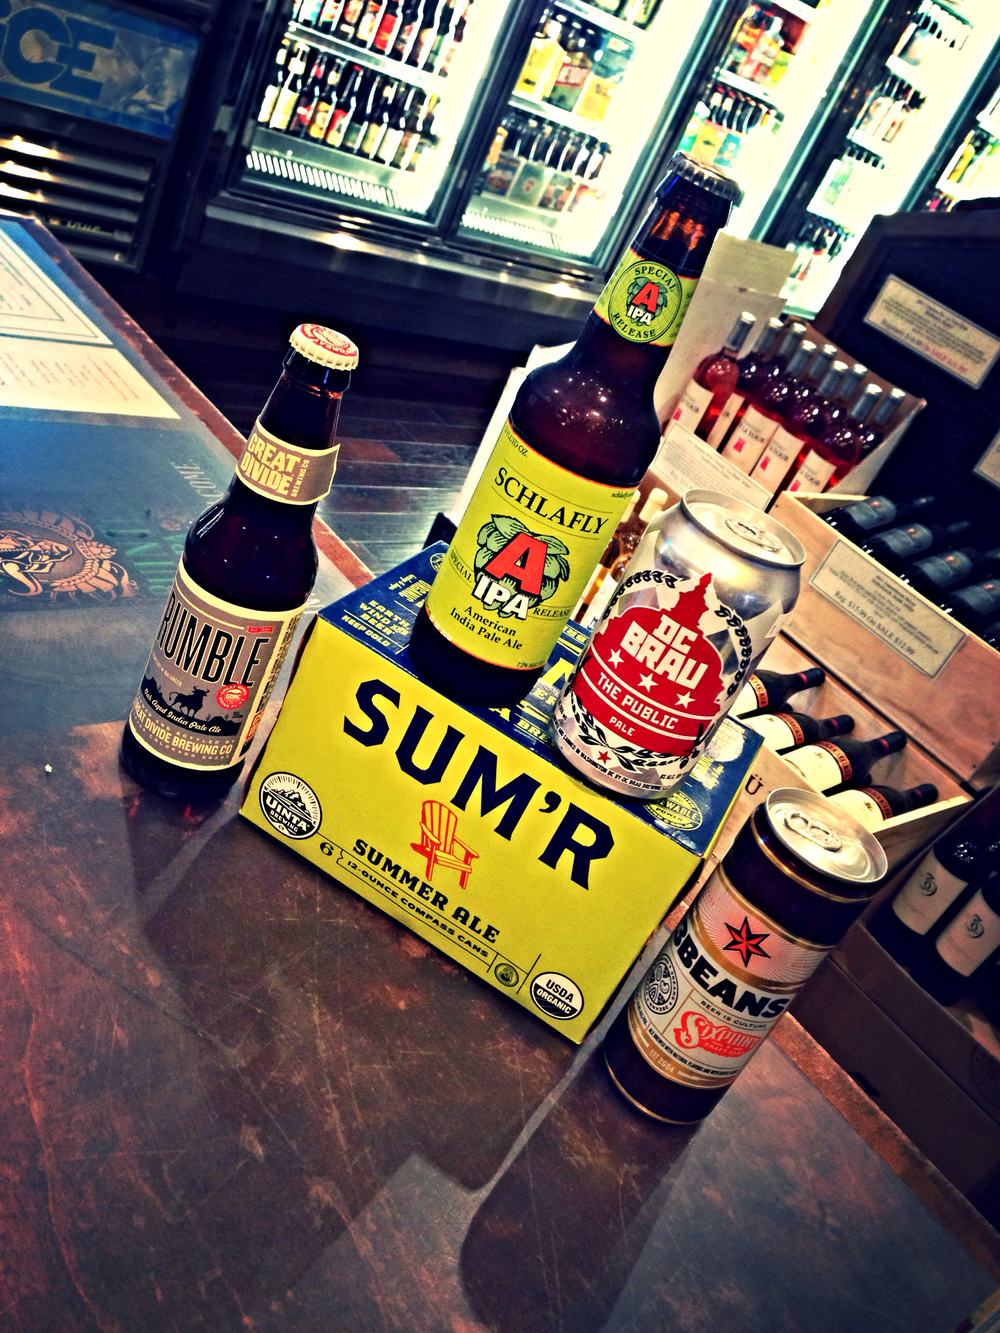 Great Divide Rumble Oak Aged IPA, Uinta Sum'r restock, DC Brau Public Pale, and Sixpoint 3 Beans